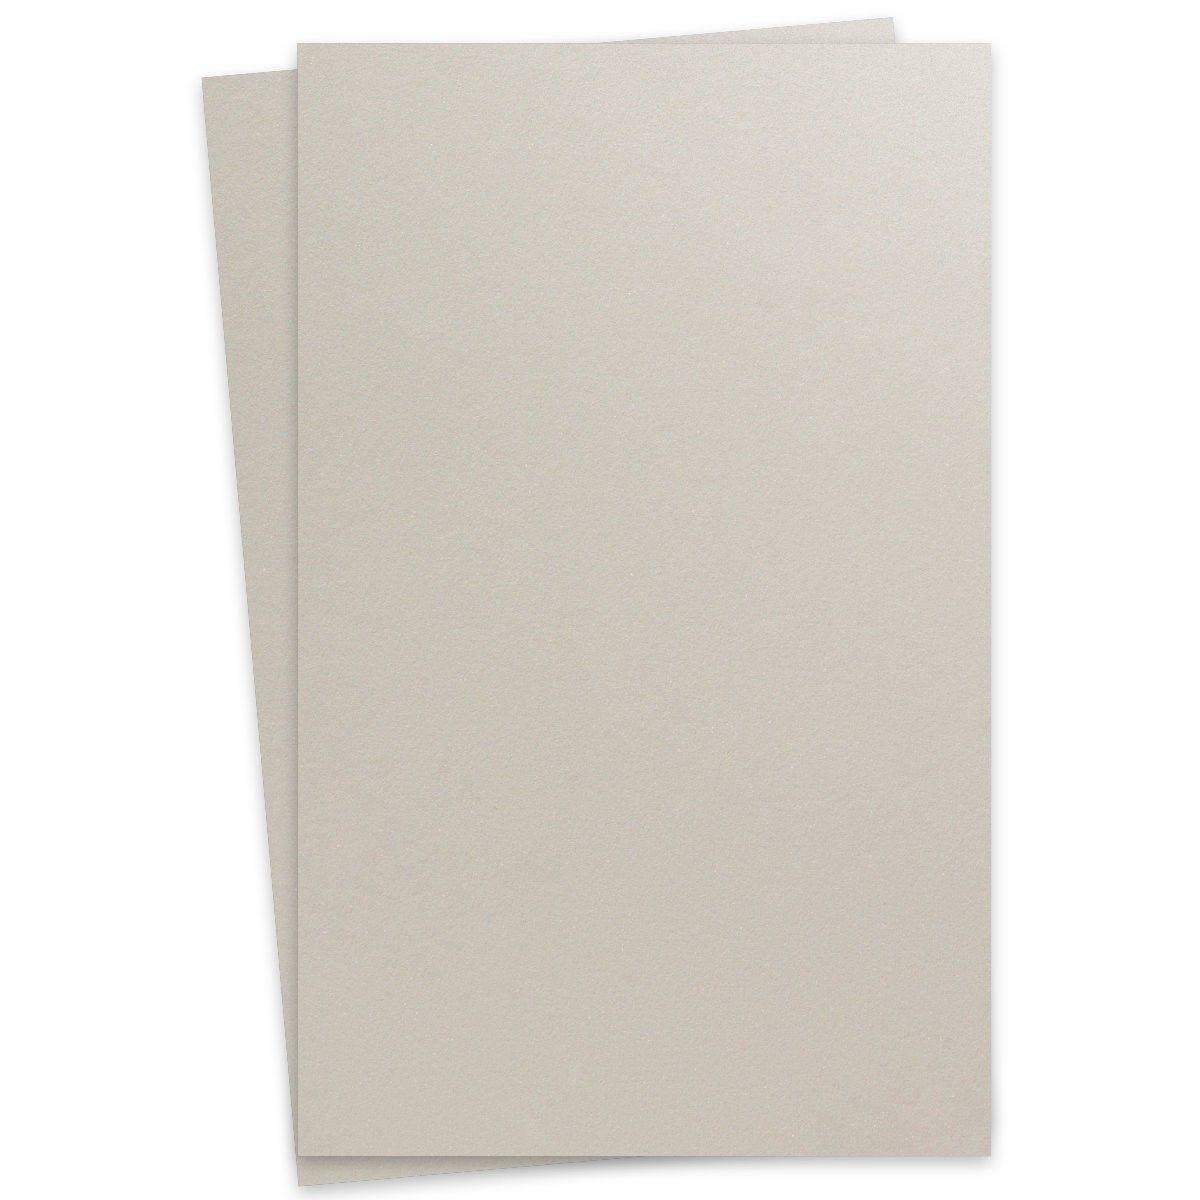 Curious Metallic Lustre 11x17 Card Stock Paper 92lb Cover 100 Pk Metallic Luster Cardstock Paper Metallic Paper